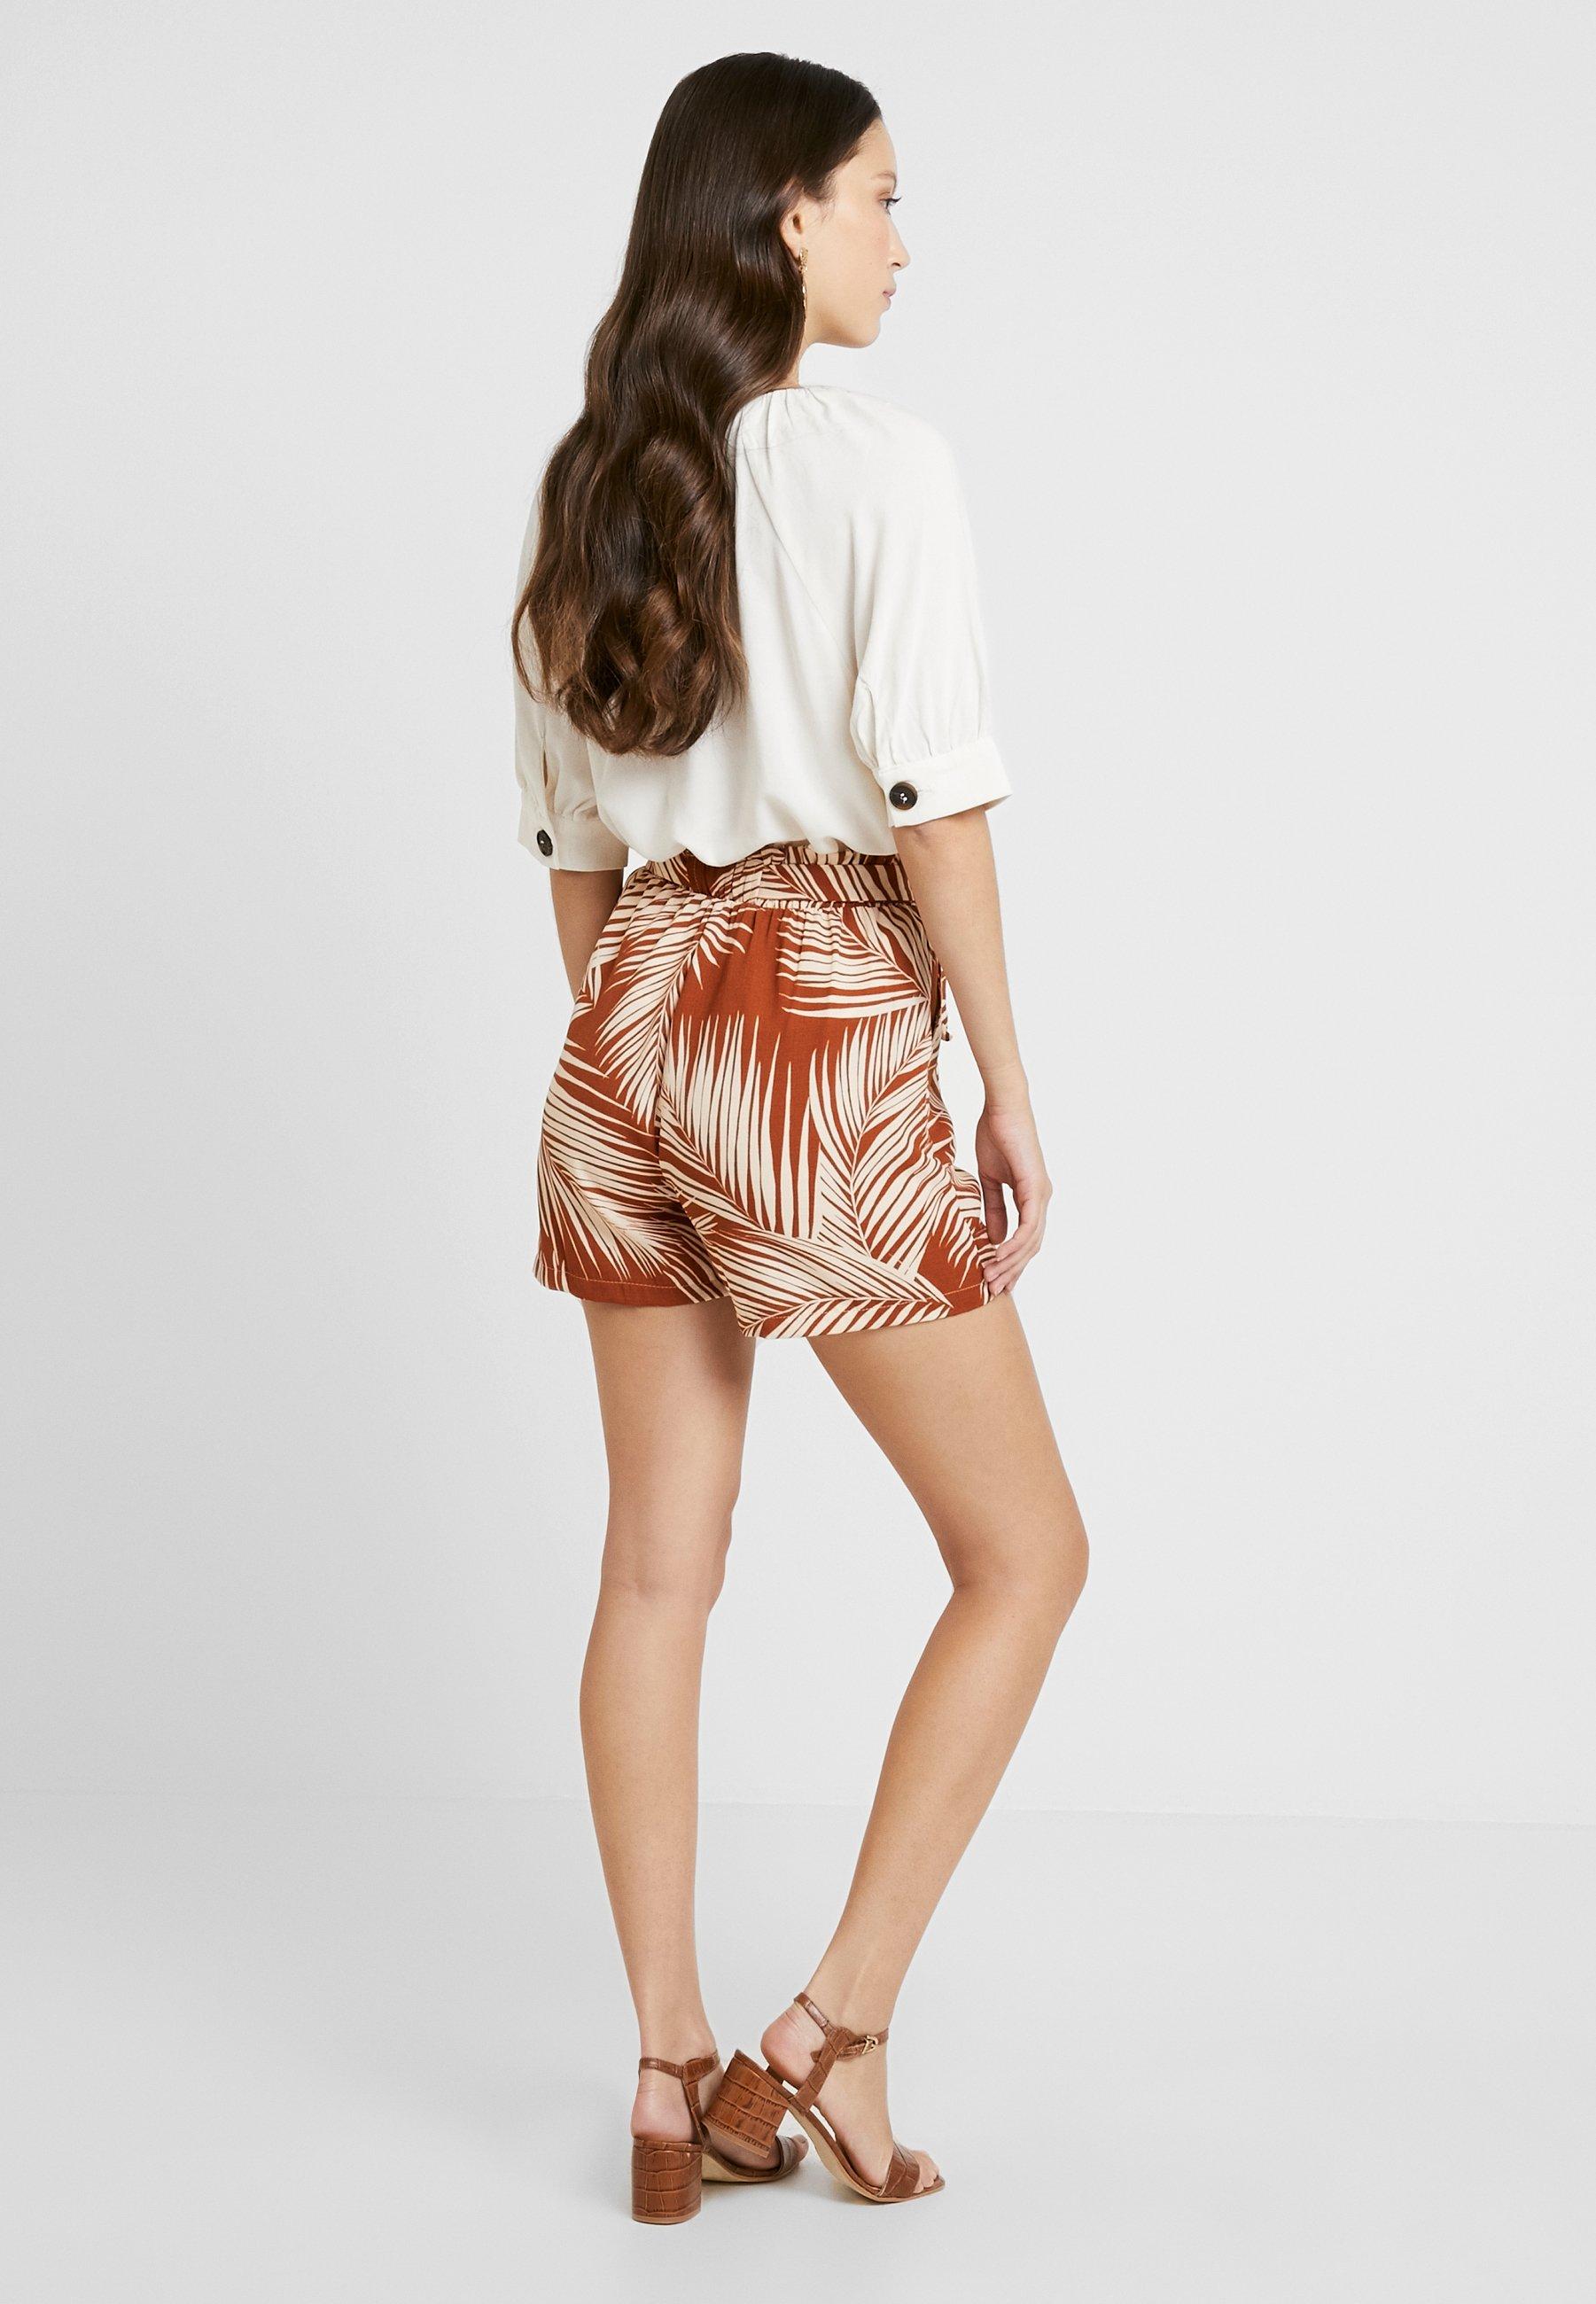 Paperbag Brown Tie Palm New Look Kendal WaistShort sdtrCxhQB